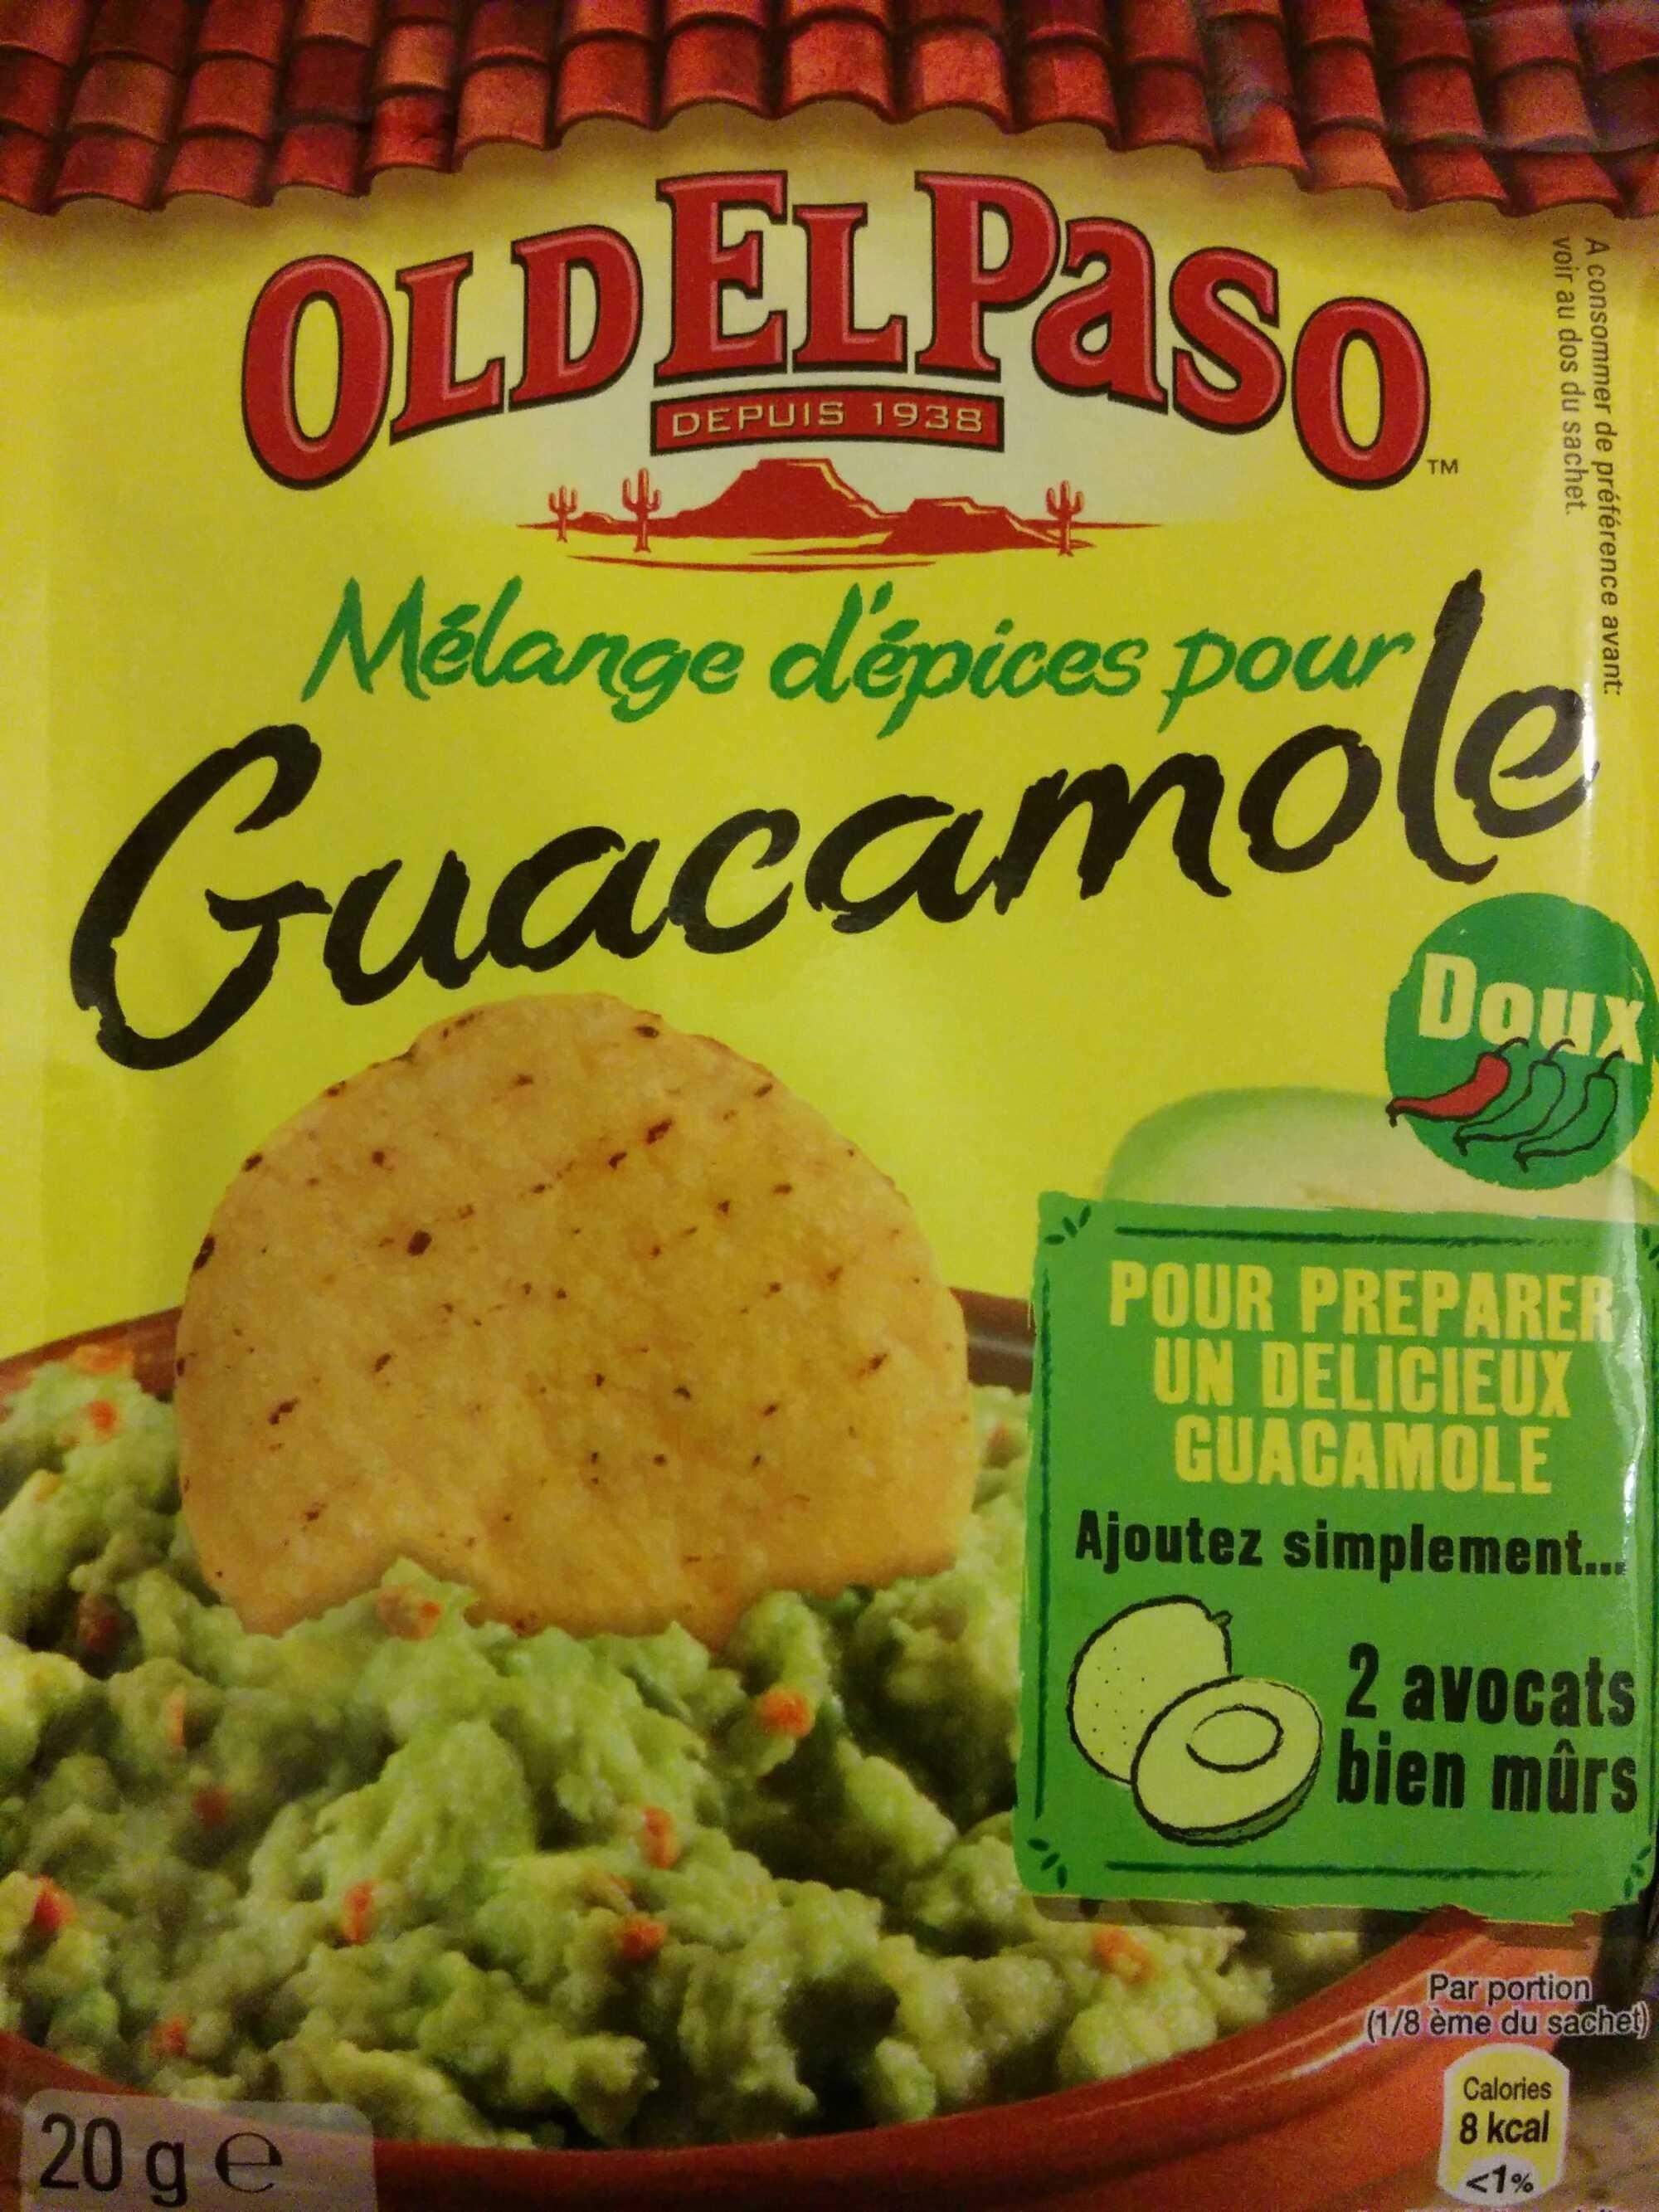 epice a guacamole